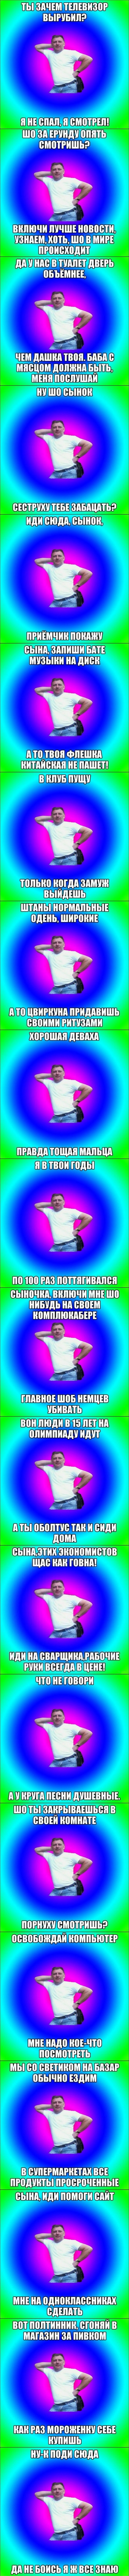 1394199907_350246511